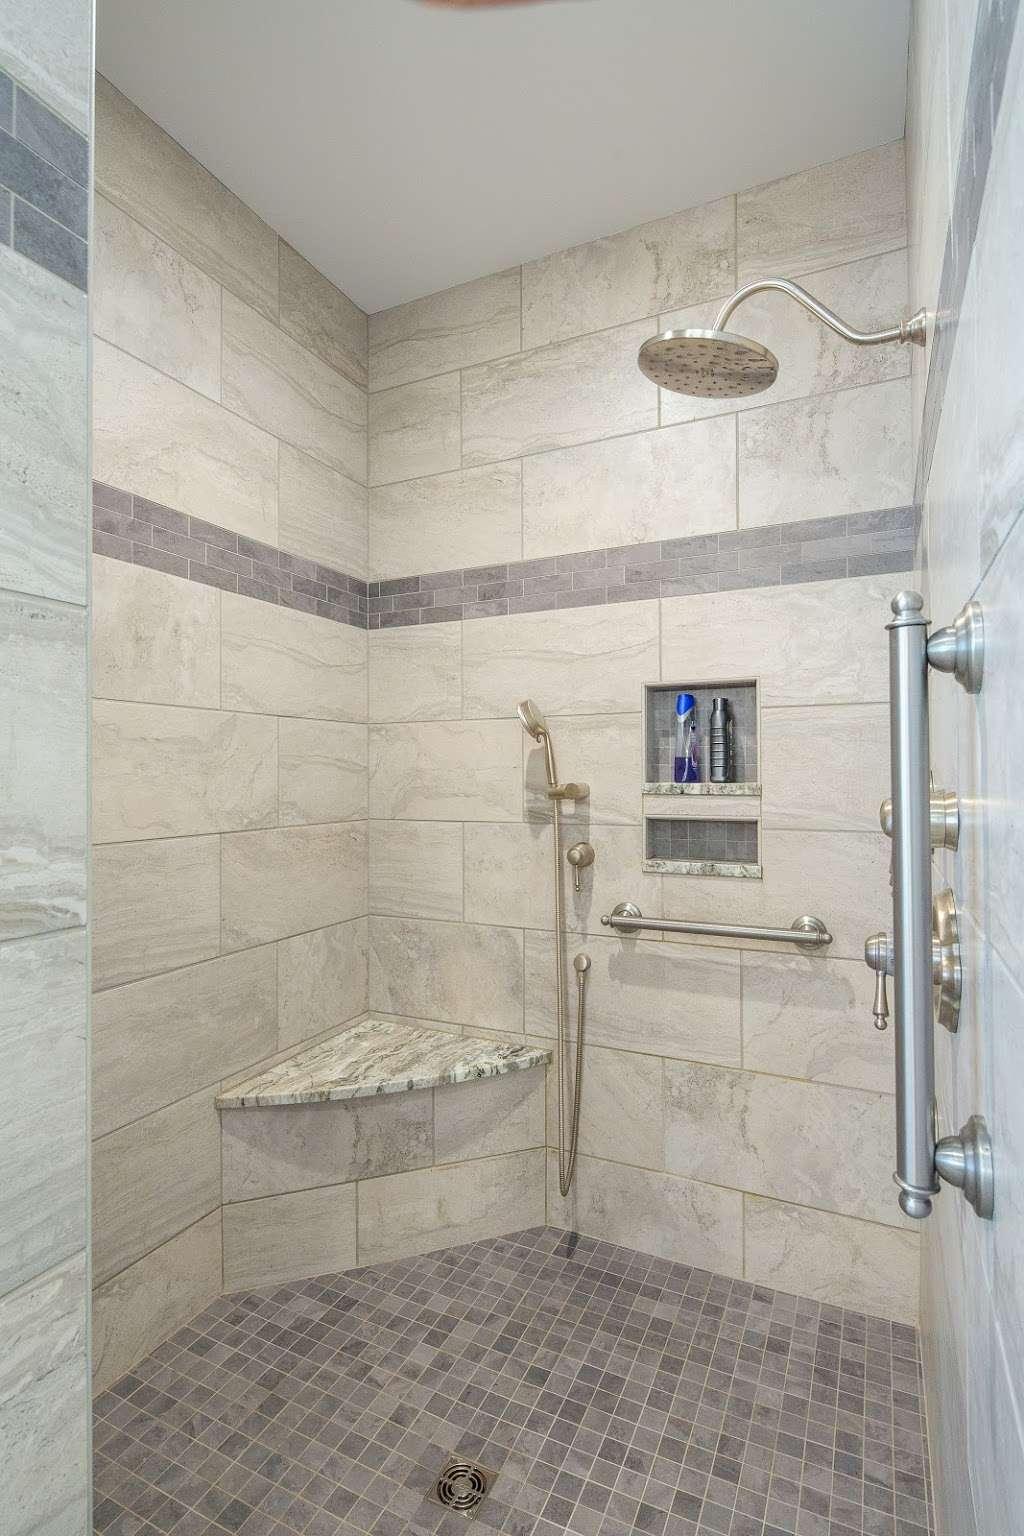 Earl Weaver Contractors LLC - painter  | Photo 9 of 9 | Address: 540 Union Rd, Lebanon, PA 17046, USA | Phone: (717) 821-1010